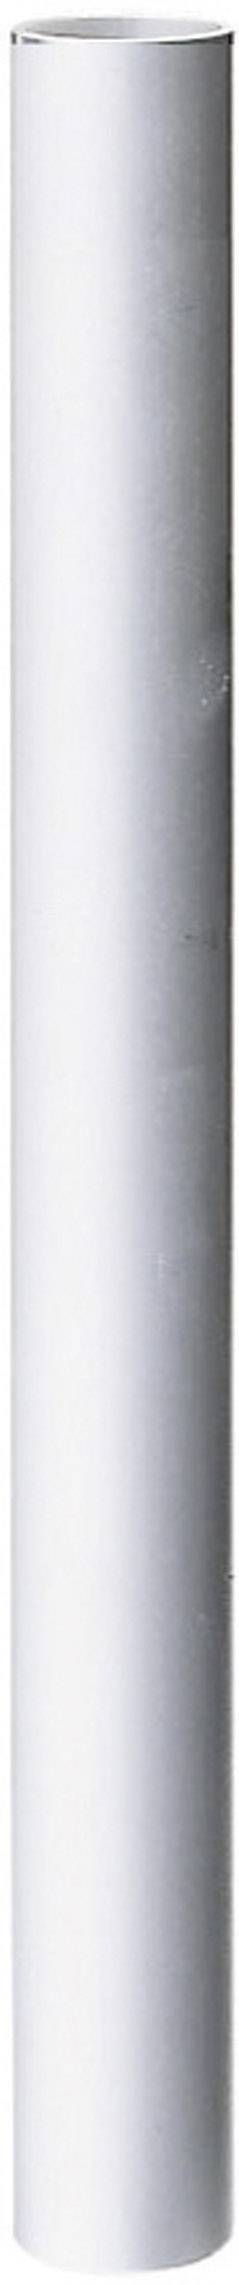 Signalizačný systém s hliníkovou rúrkou Werma Signaltechnik 975.845.10 Vhodné pre rad (signálna technika) KombiSIGN 70